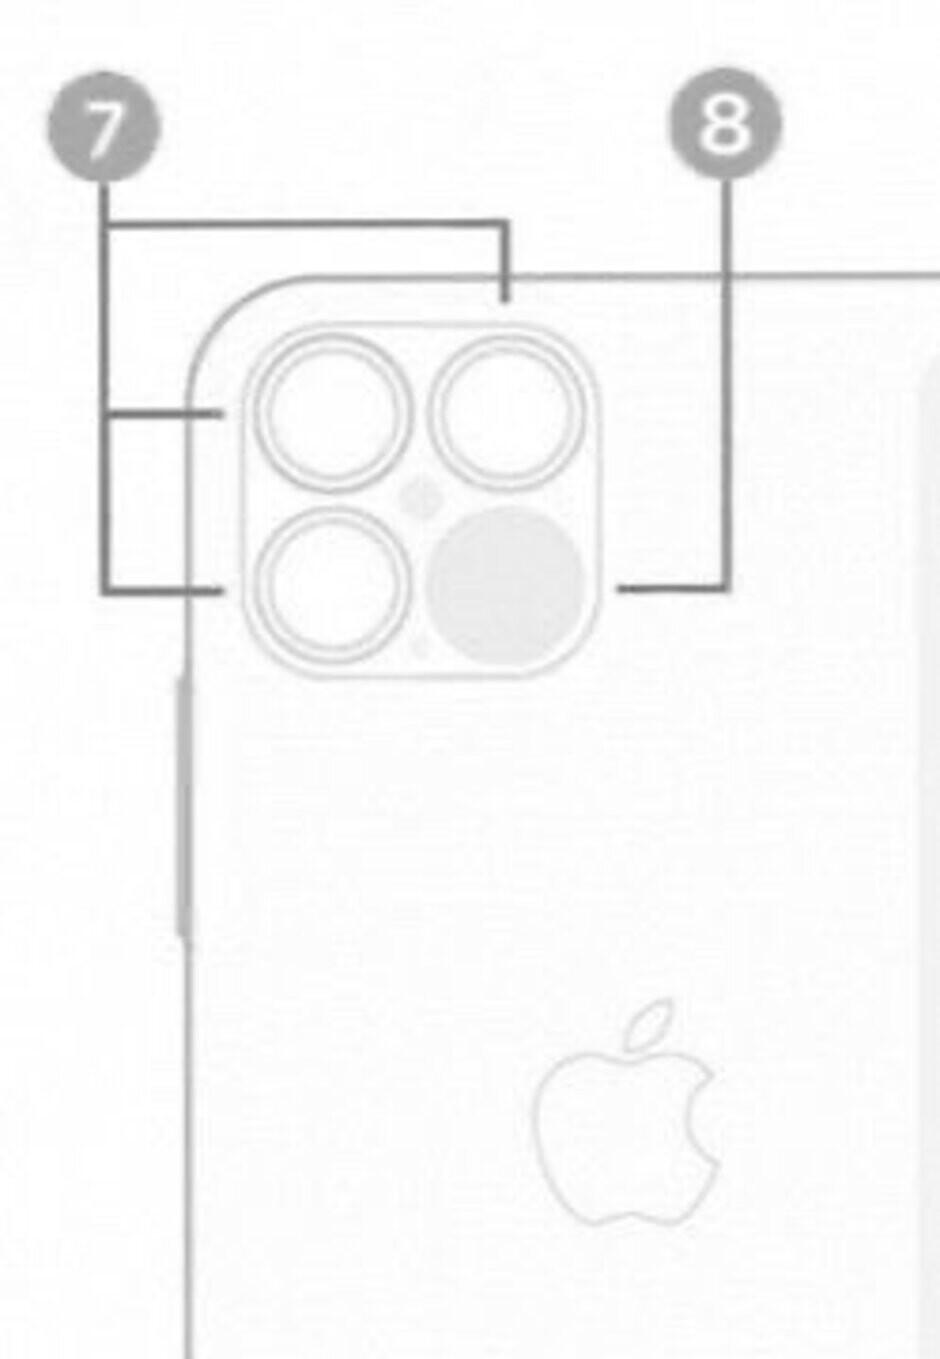 Major iPhone 12 Pro 5G leak reveals new camera design and LiDAR scanner